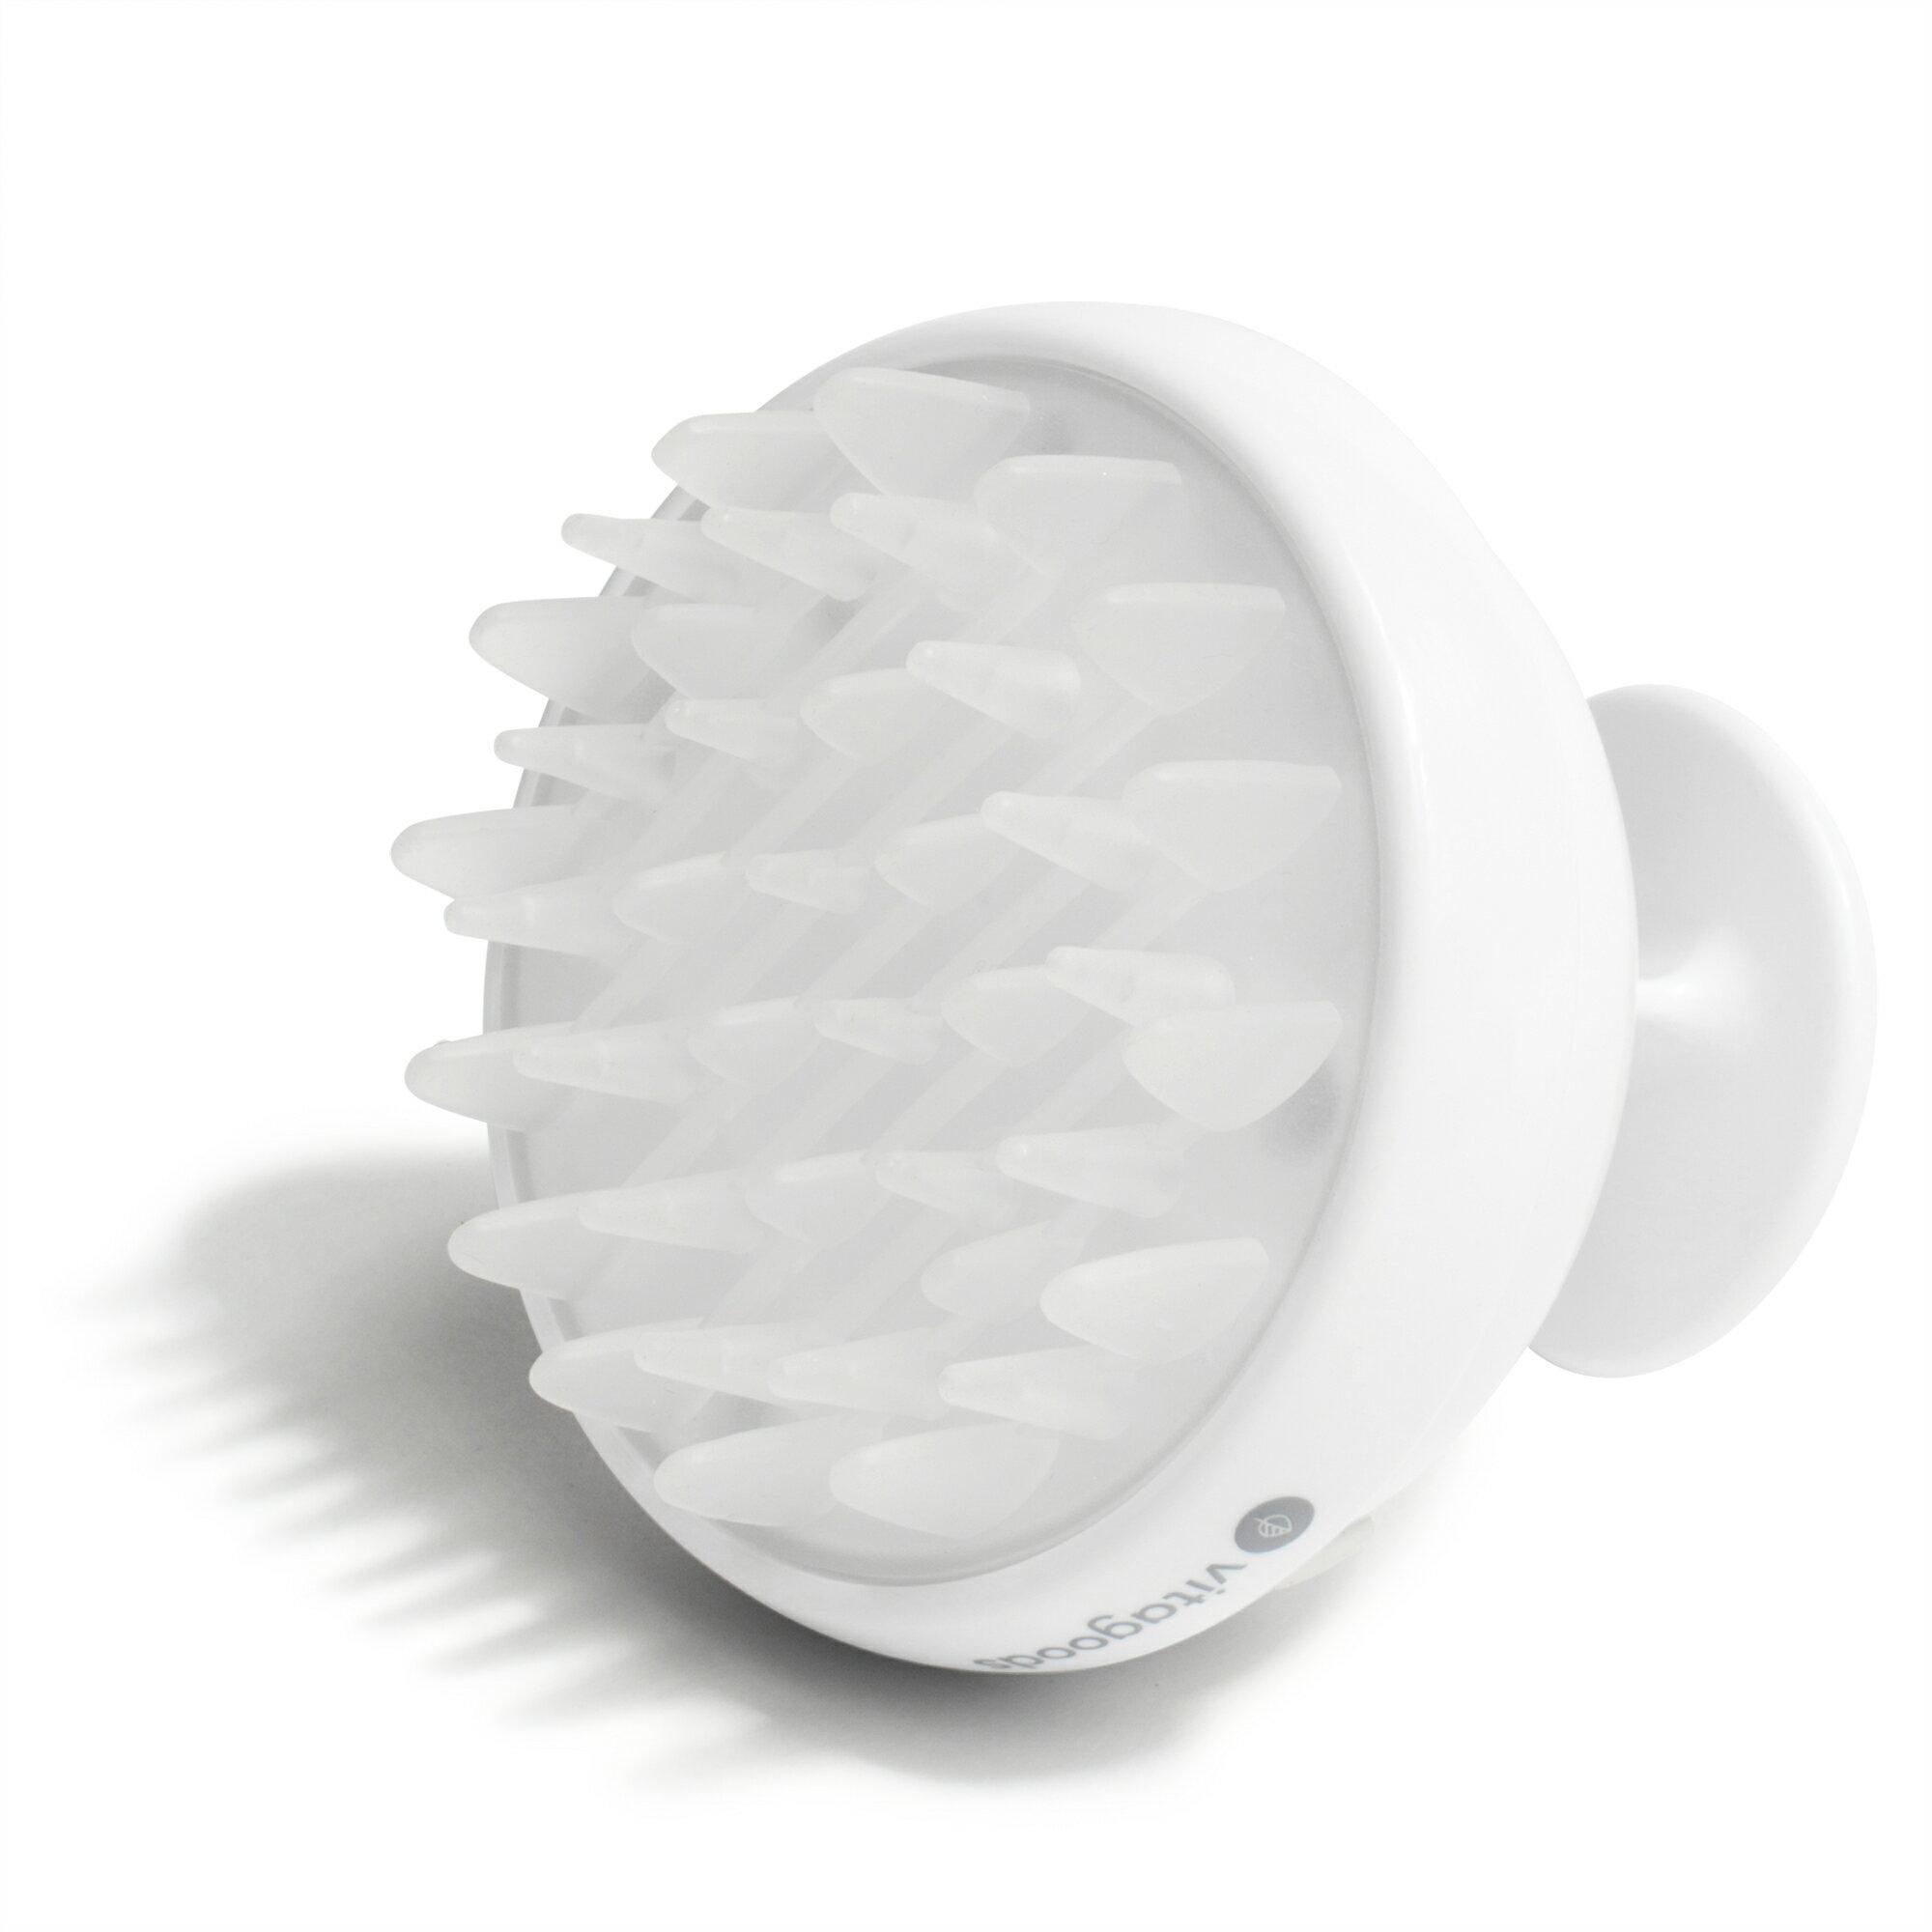 Vibrating Scalp Massaging Shampoo Brush 0